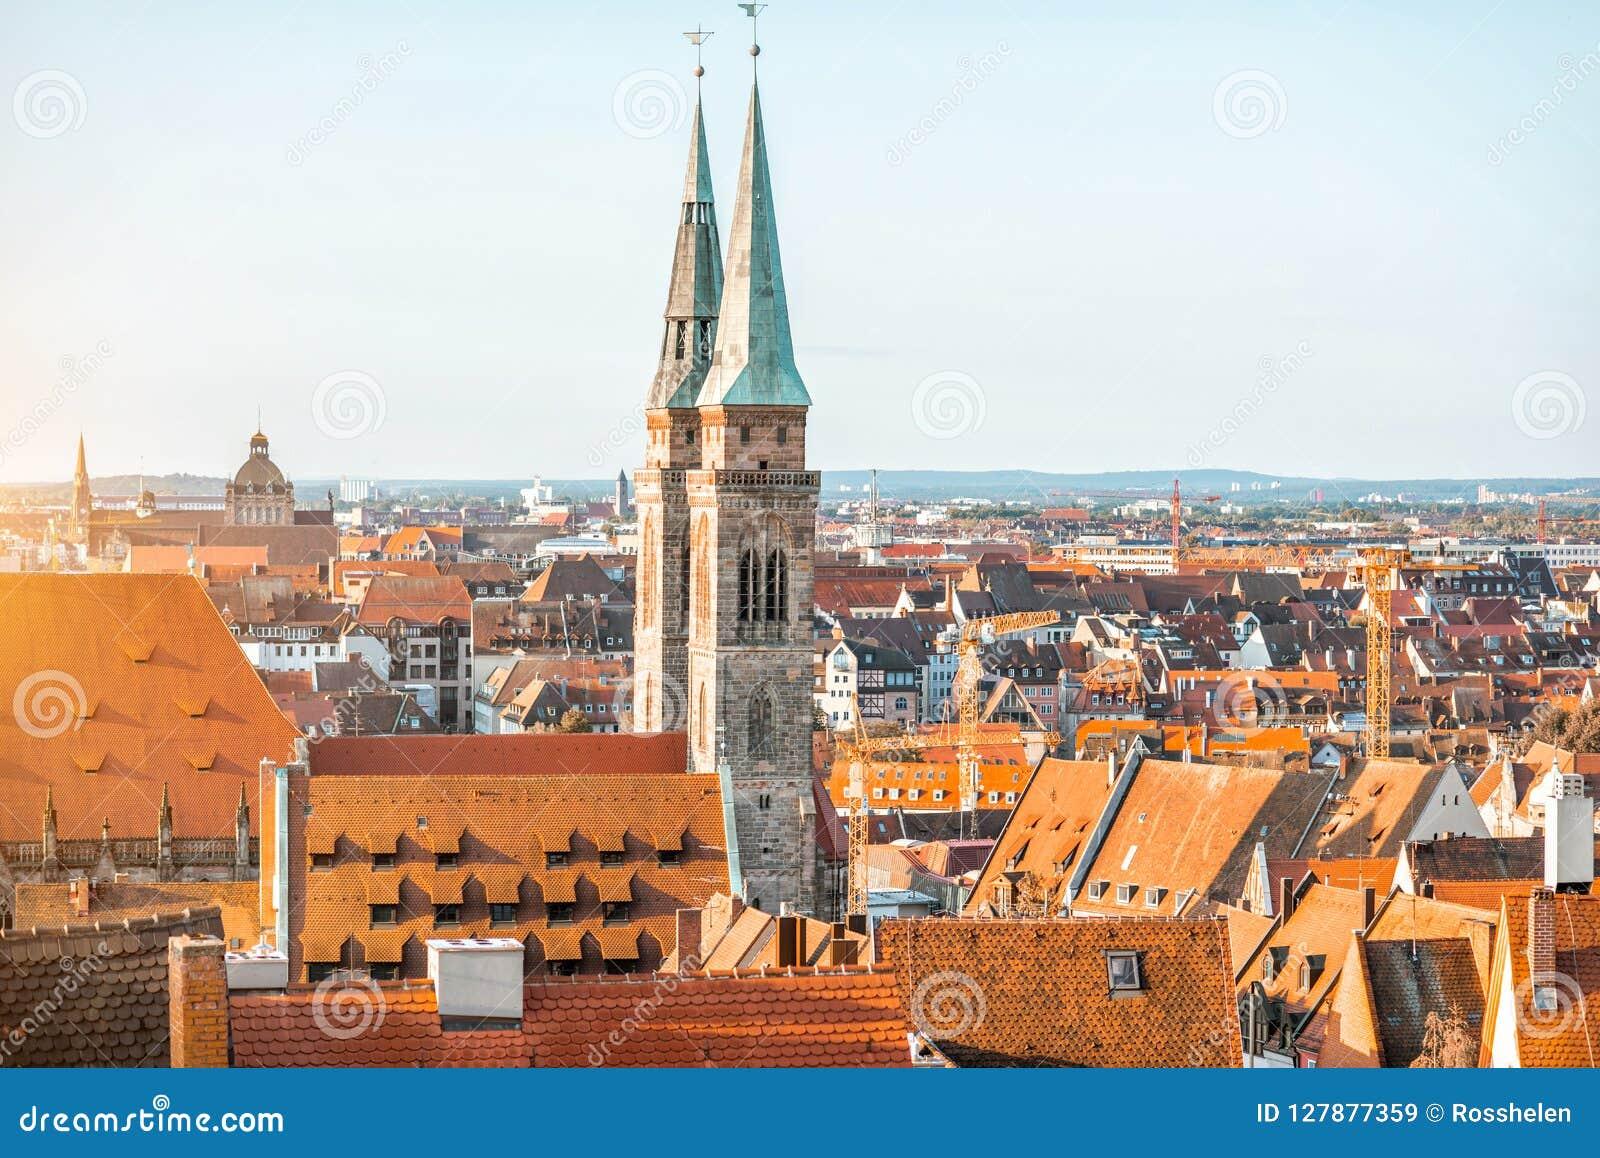 Vecchia città nella città di Nurnberg, Germania